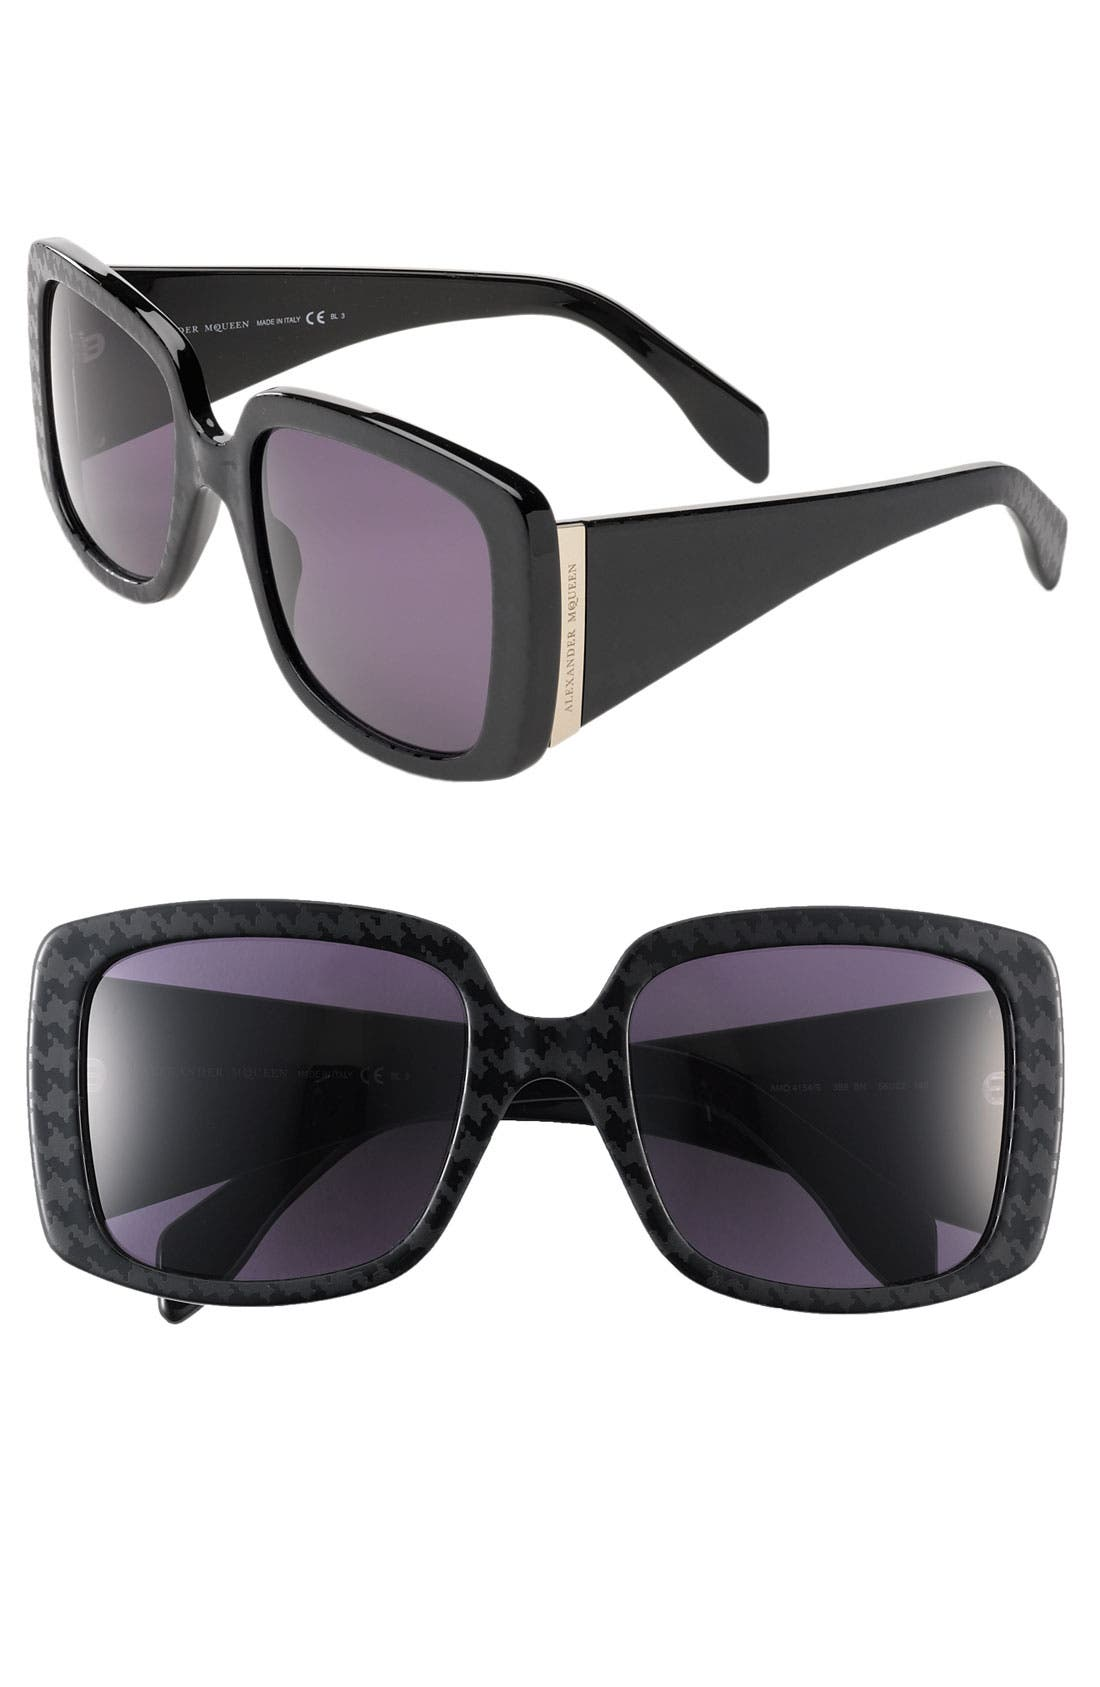 Alternate Image 1 Selected - Alexander McQueen Oversized Square Sunglasses